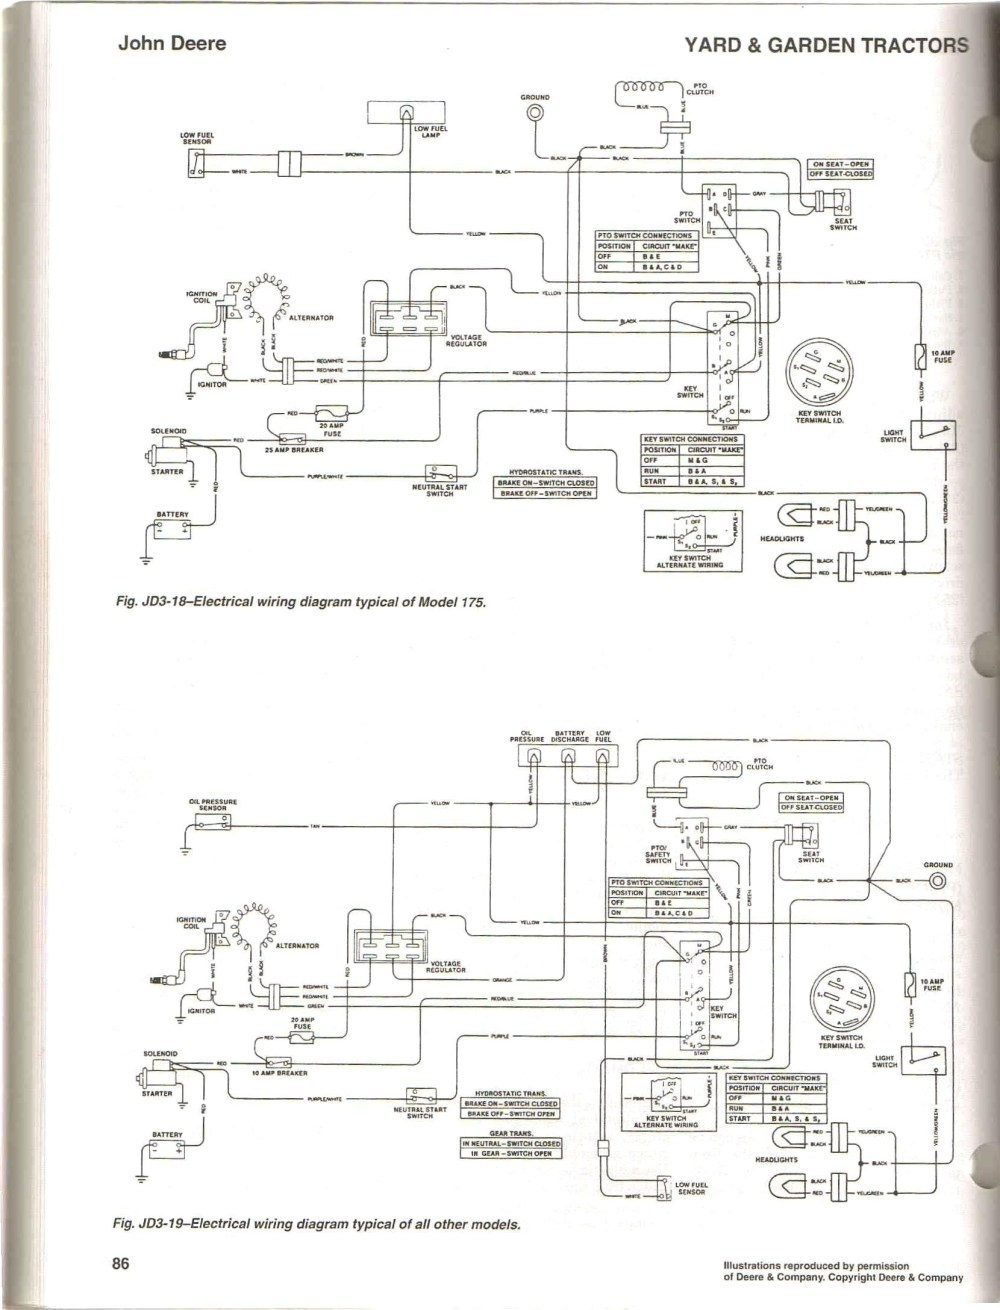 medium resolution of john deere f525 wiring diagram wiring diagram for john deere f525 refrence nett john deere